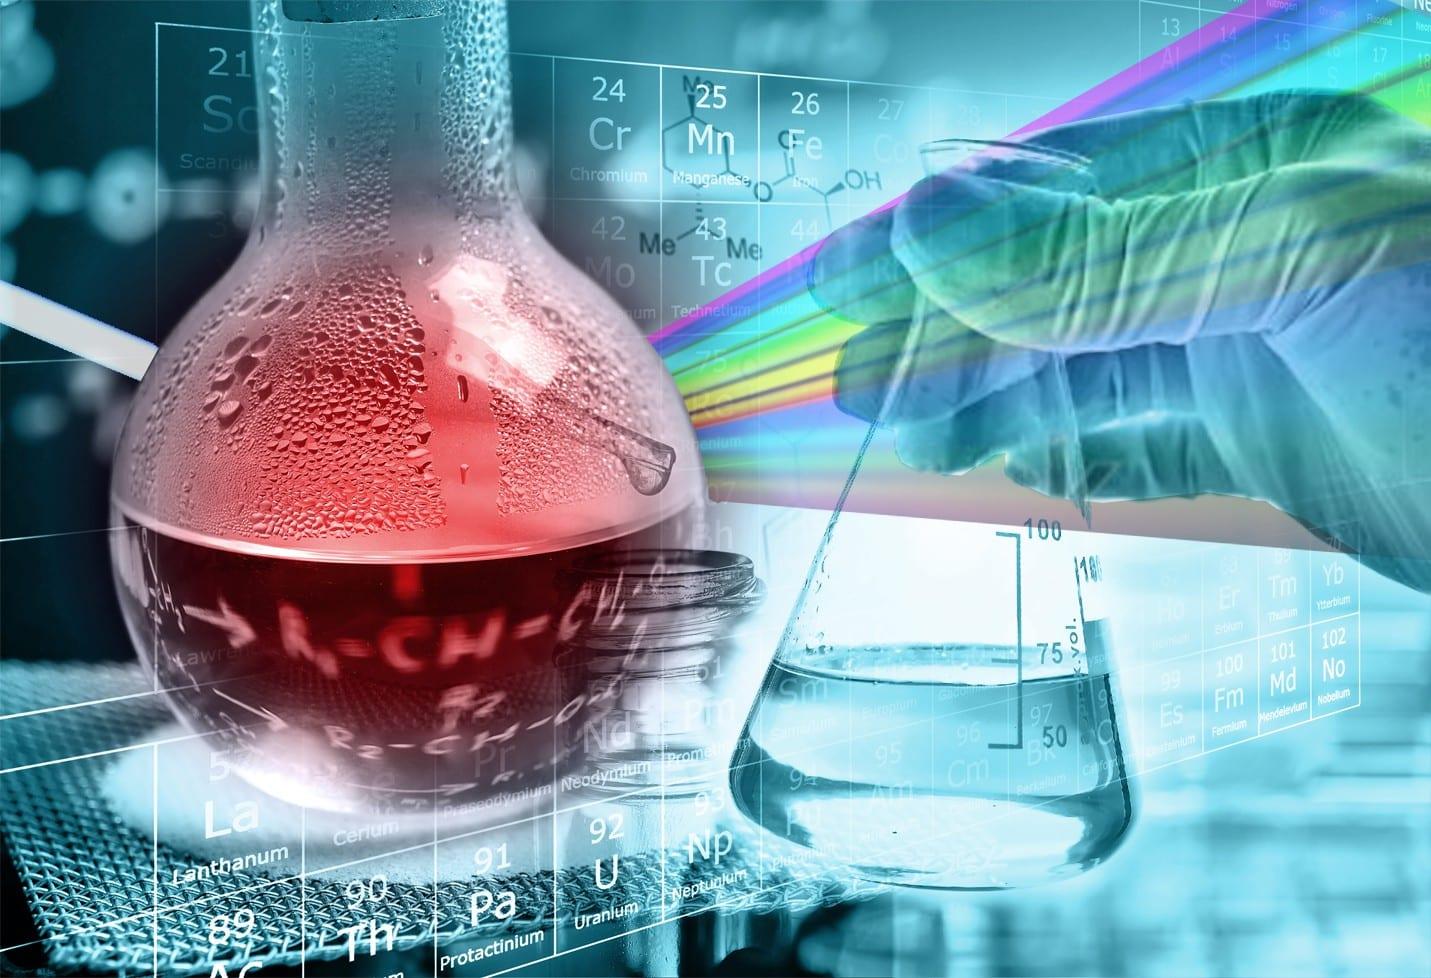 Spectrochemsitry Systems